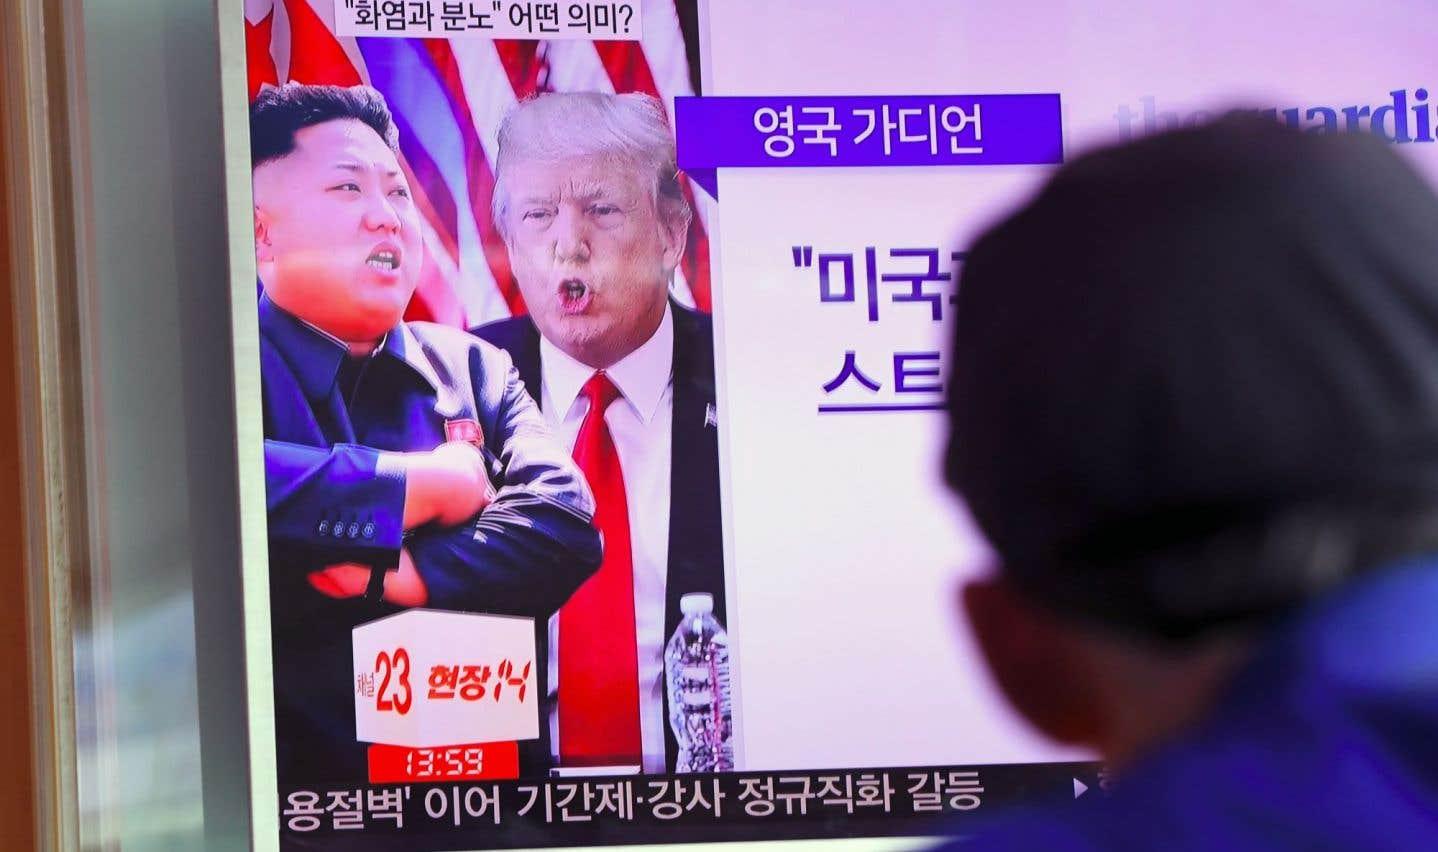 Washington menace de renverser Kim Jong-un